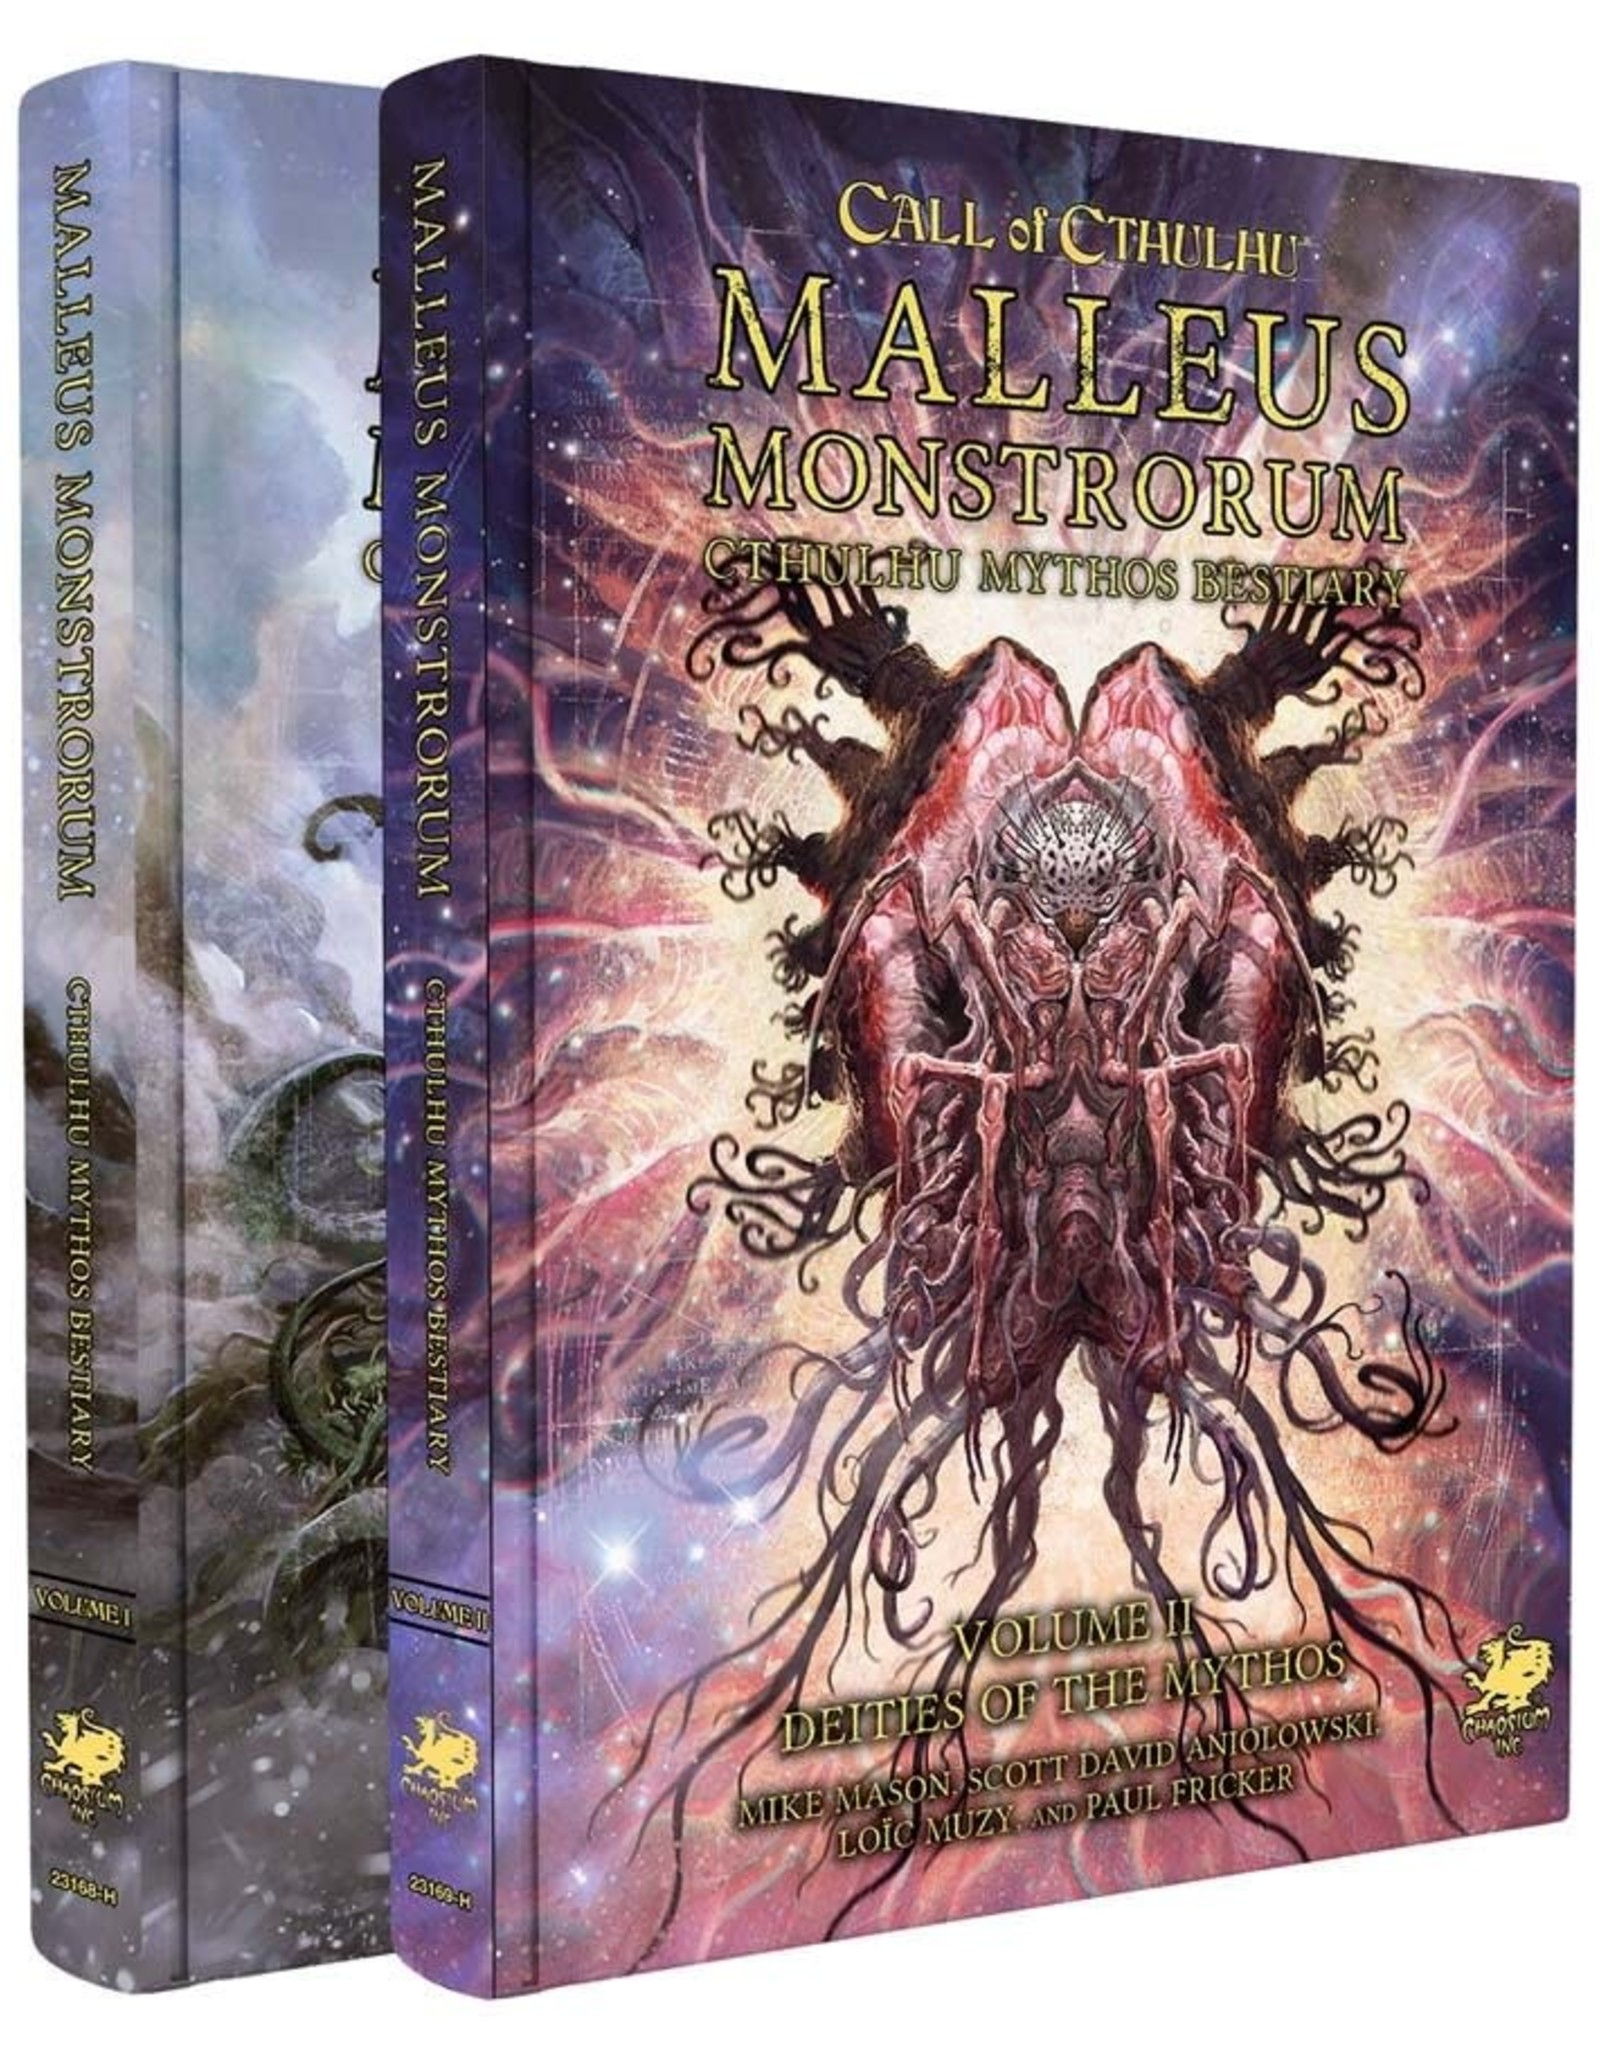 Chaosium Call of Cthulhu: Malleus Monstrorum Cthulhu Mythos Bestiary Two Volume Slipcase Set [Preorder]